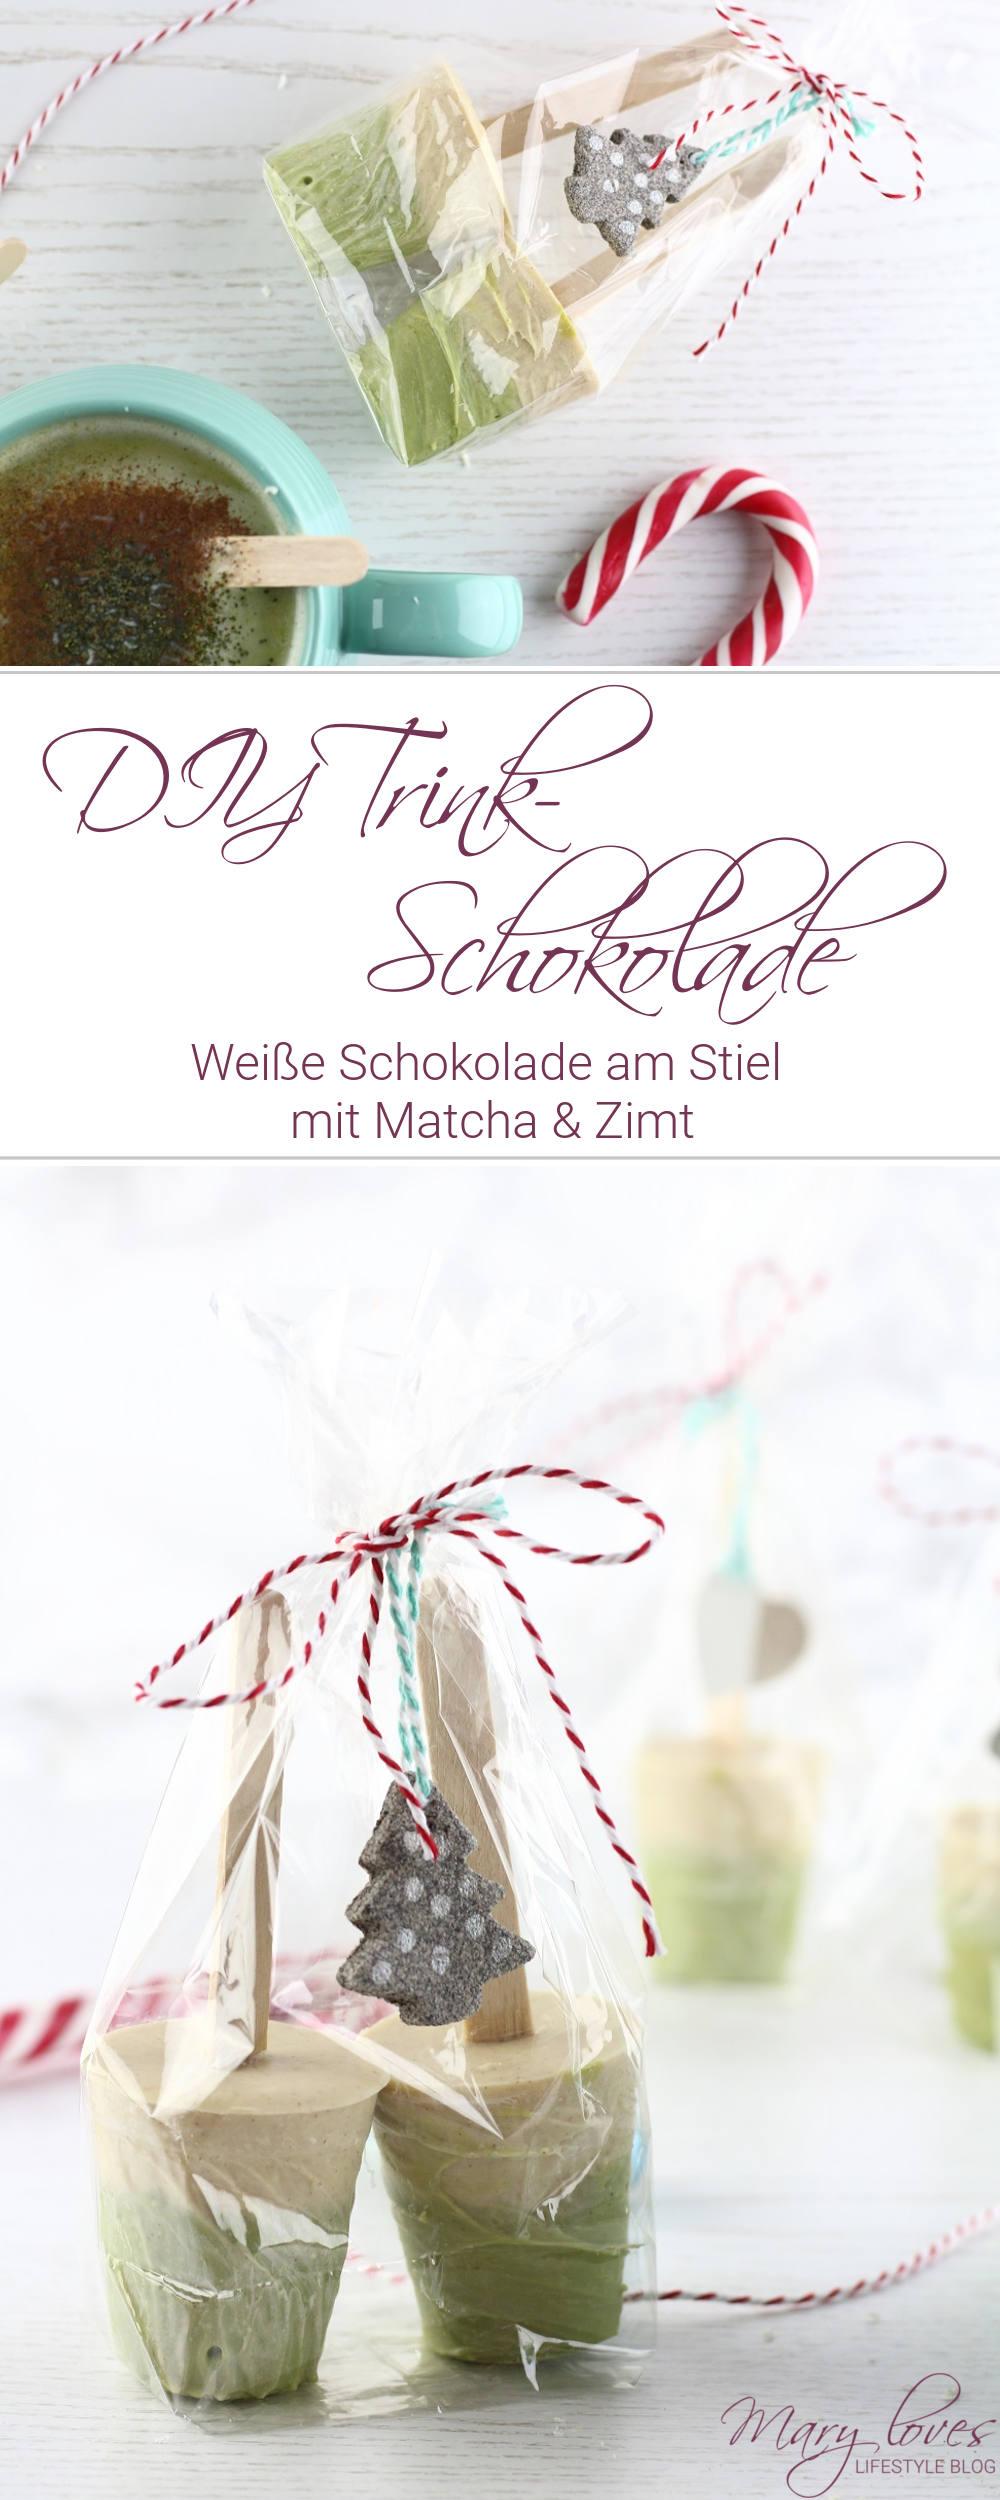 DIY Trinkschokolade am Stiel - Weiße Schokolade mit Matcha und Zimt - #diytrinkschokolade #schokoladeamstiel #weißeschokolade #heißeweißeschokolade #matcha #heißeschokolade #geschenkidee